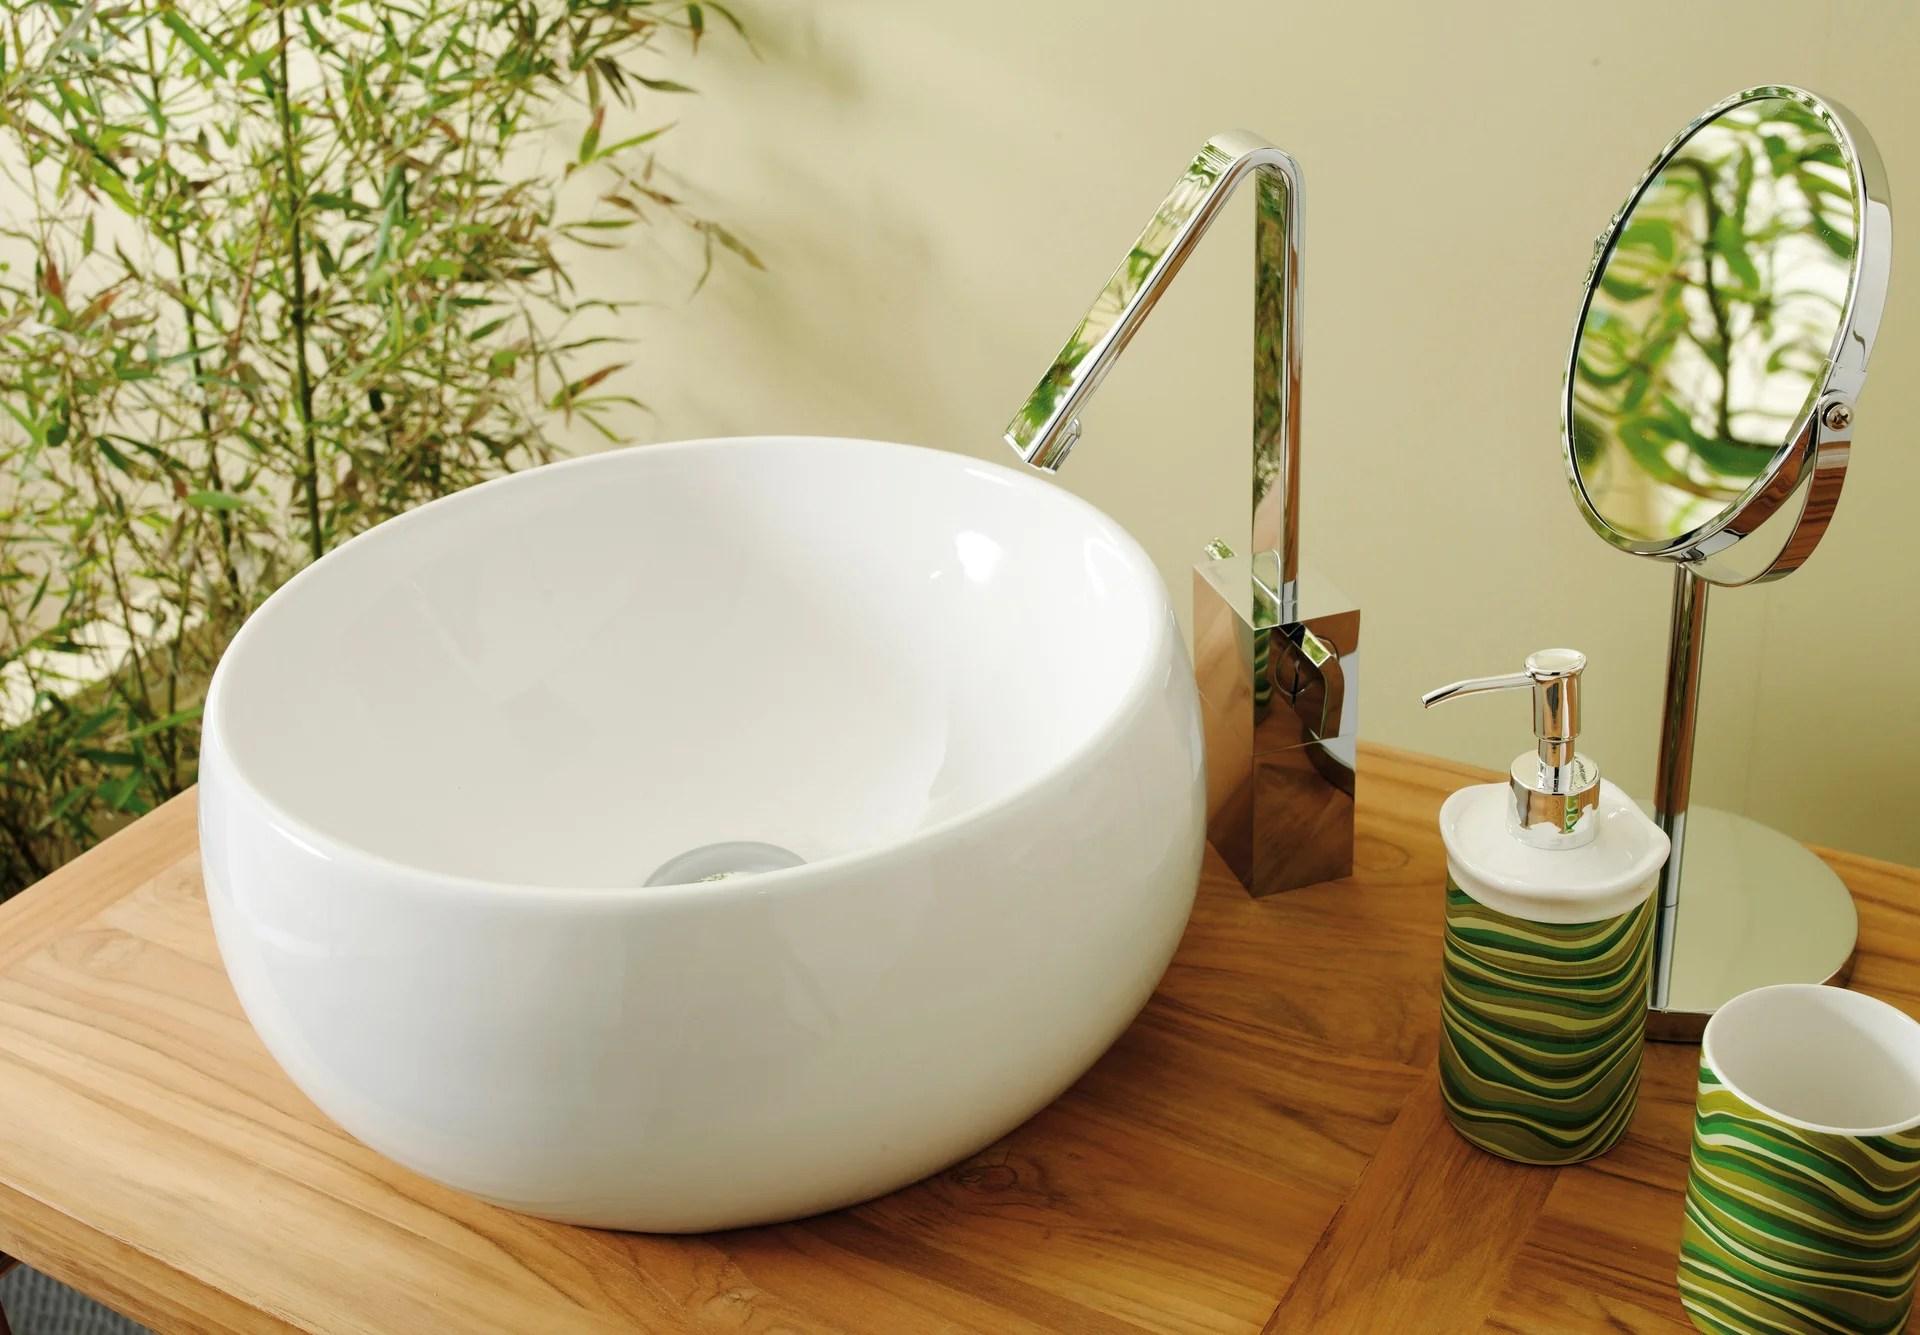 Vasque A Poser Ceramique Diam 38 Cm Blanc Lune Leroy Merlin